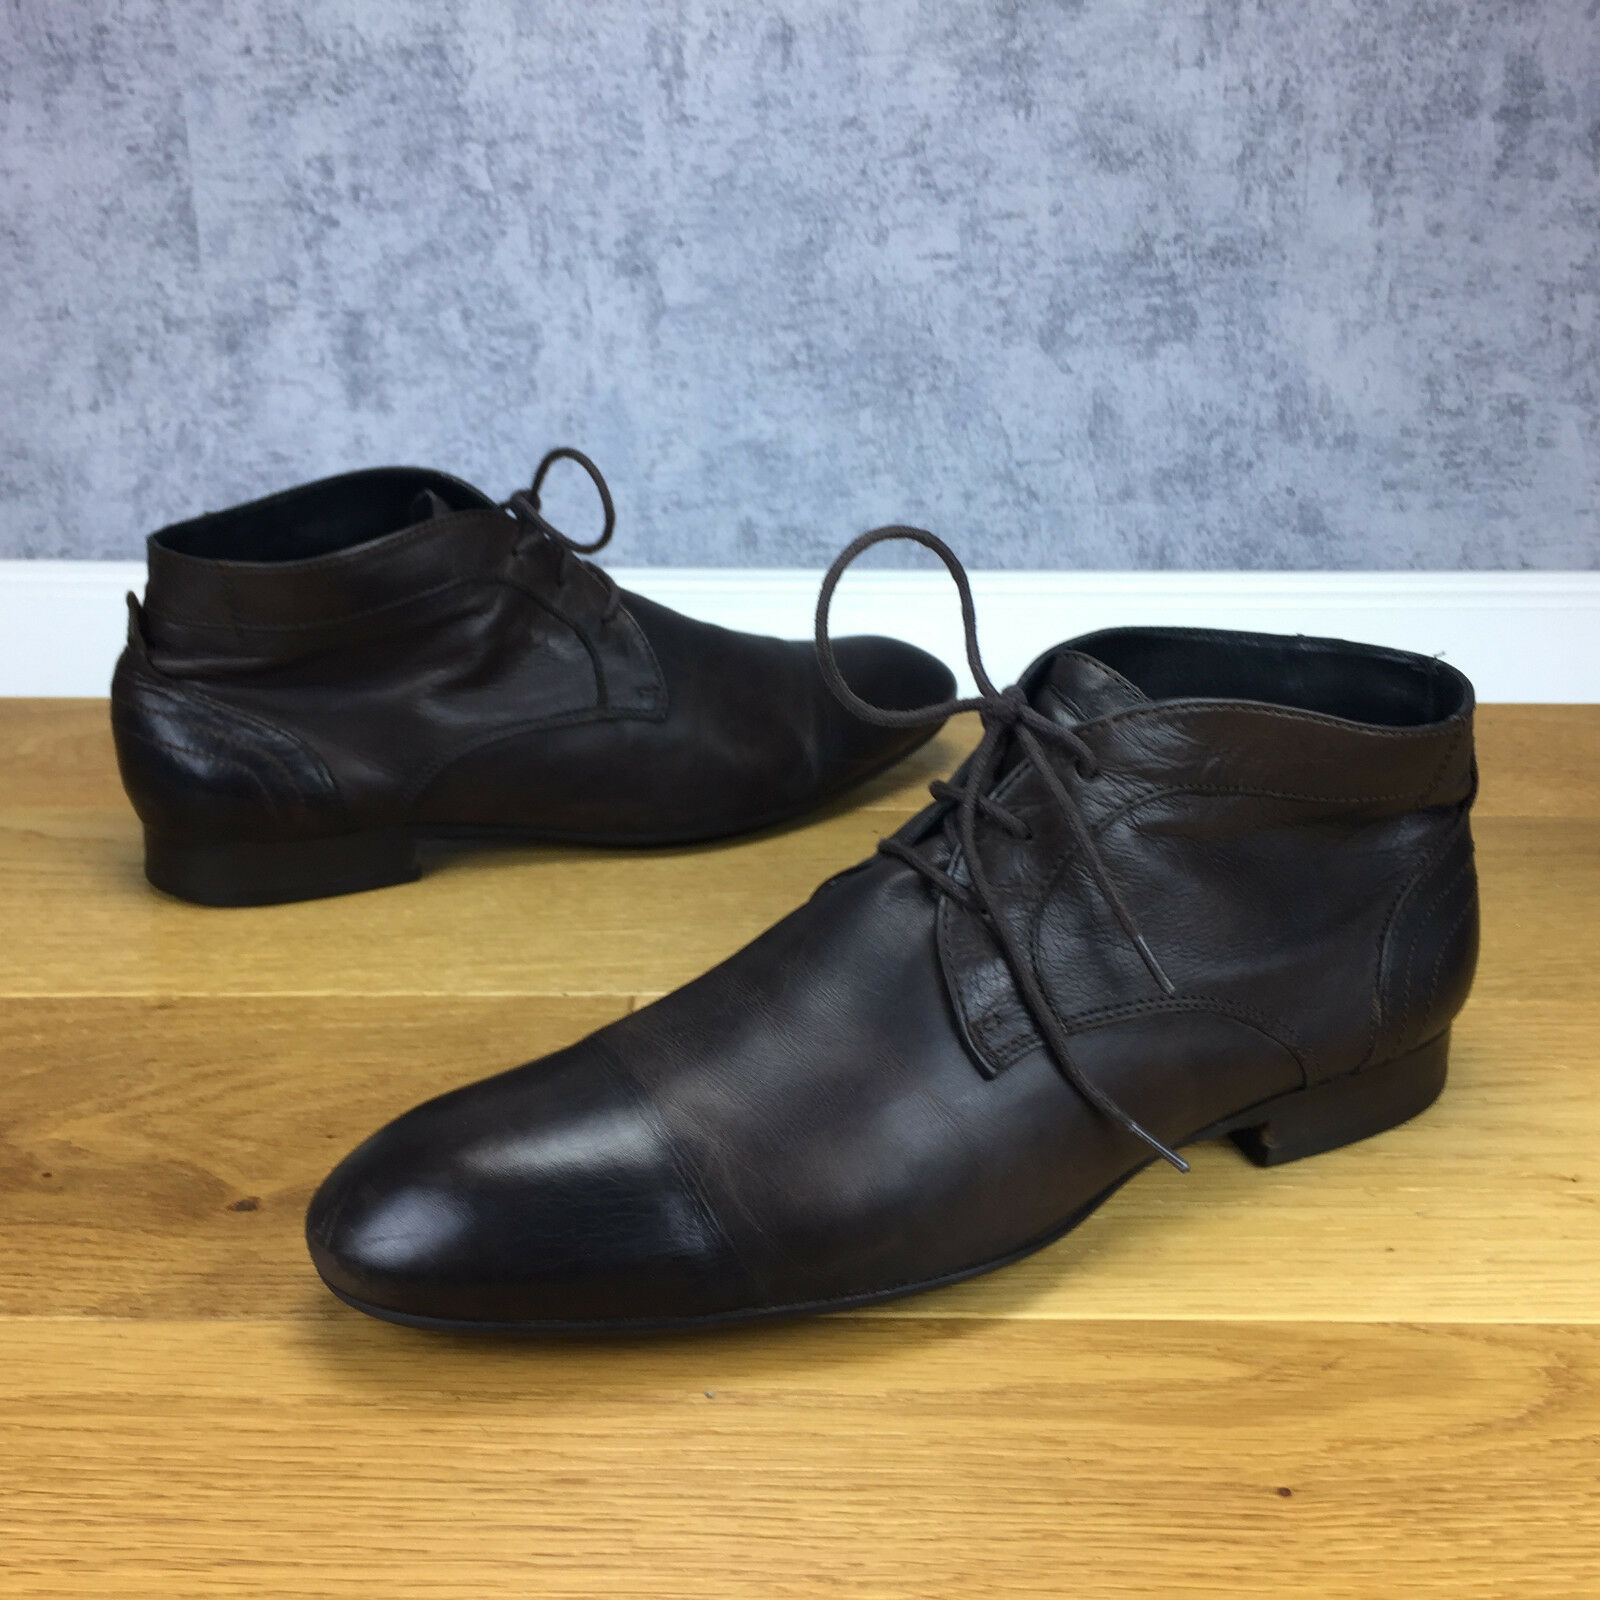 Stiefel By 144 2374Gr H Damenw348 Schuhe Hudson 3TKJl1cuF